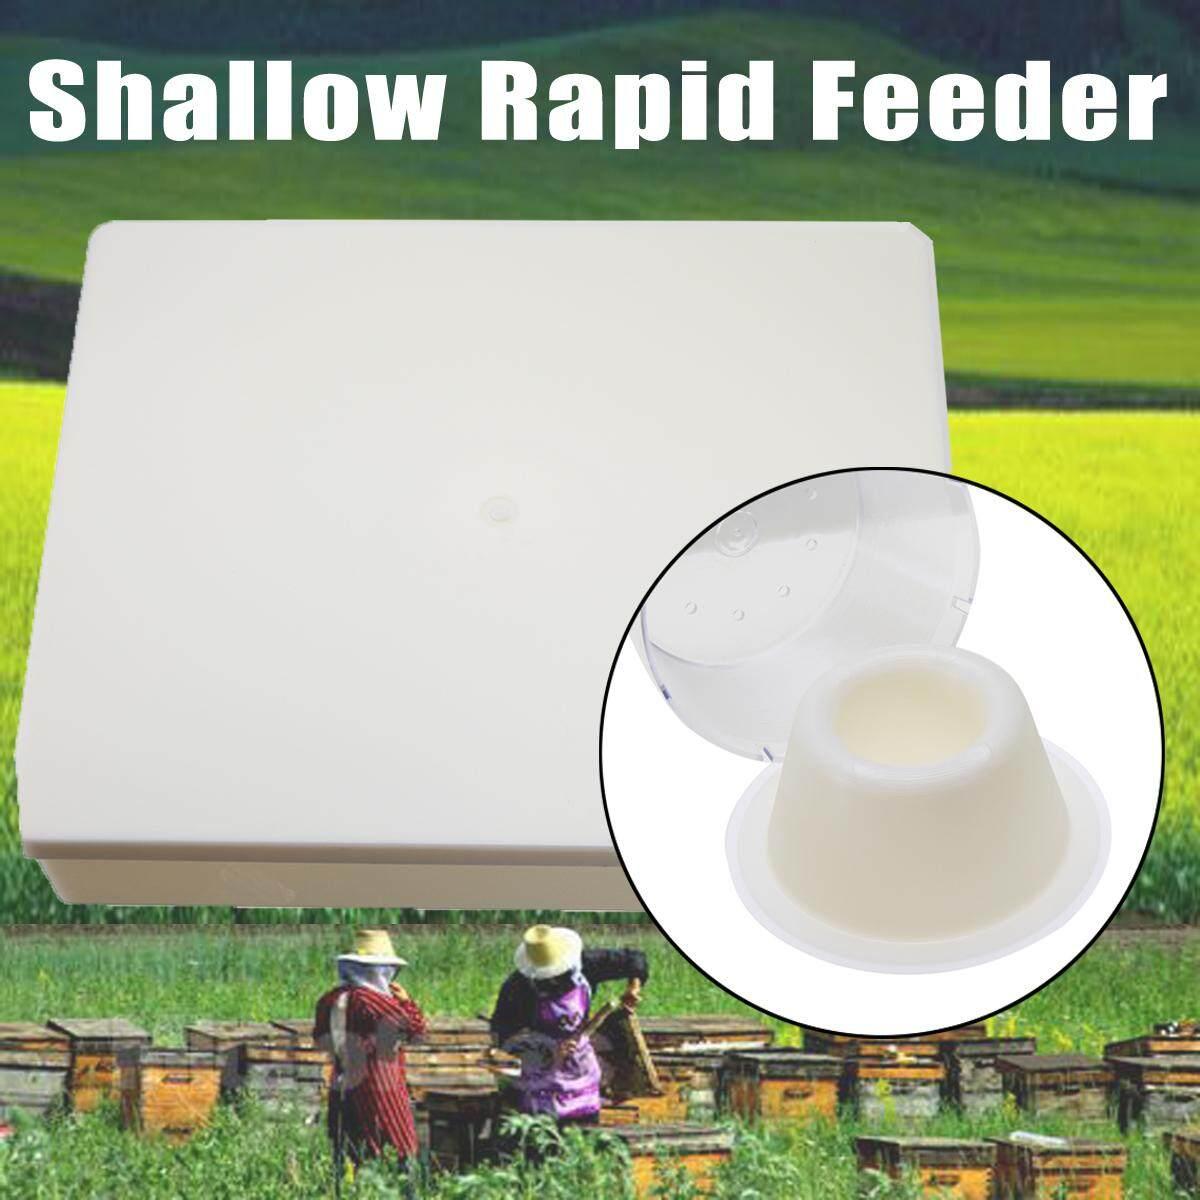 Hình ảnh 4 Litres 1 Gallon(8 pints) Shallow Rapid Feeder For Bees Feeding Transparent Cup - intl